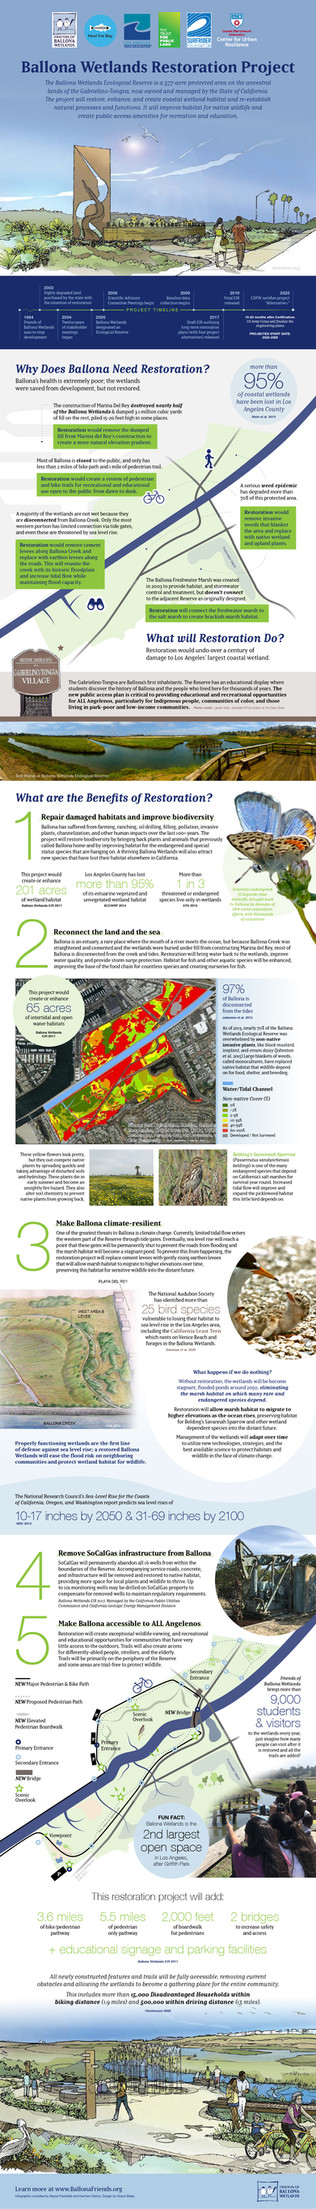 Ballona Wetlands Restoration Infographic